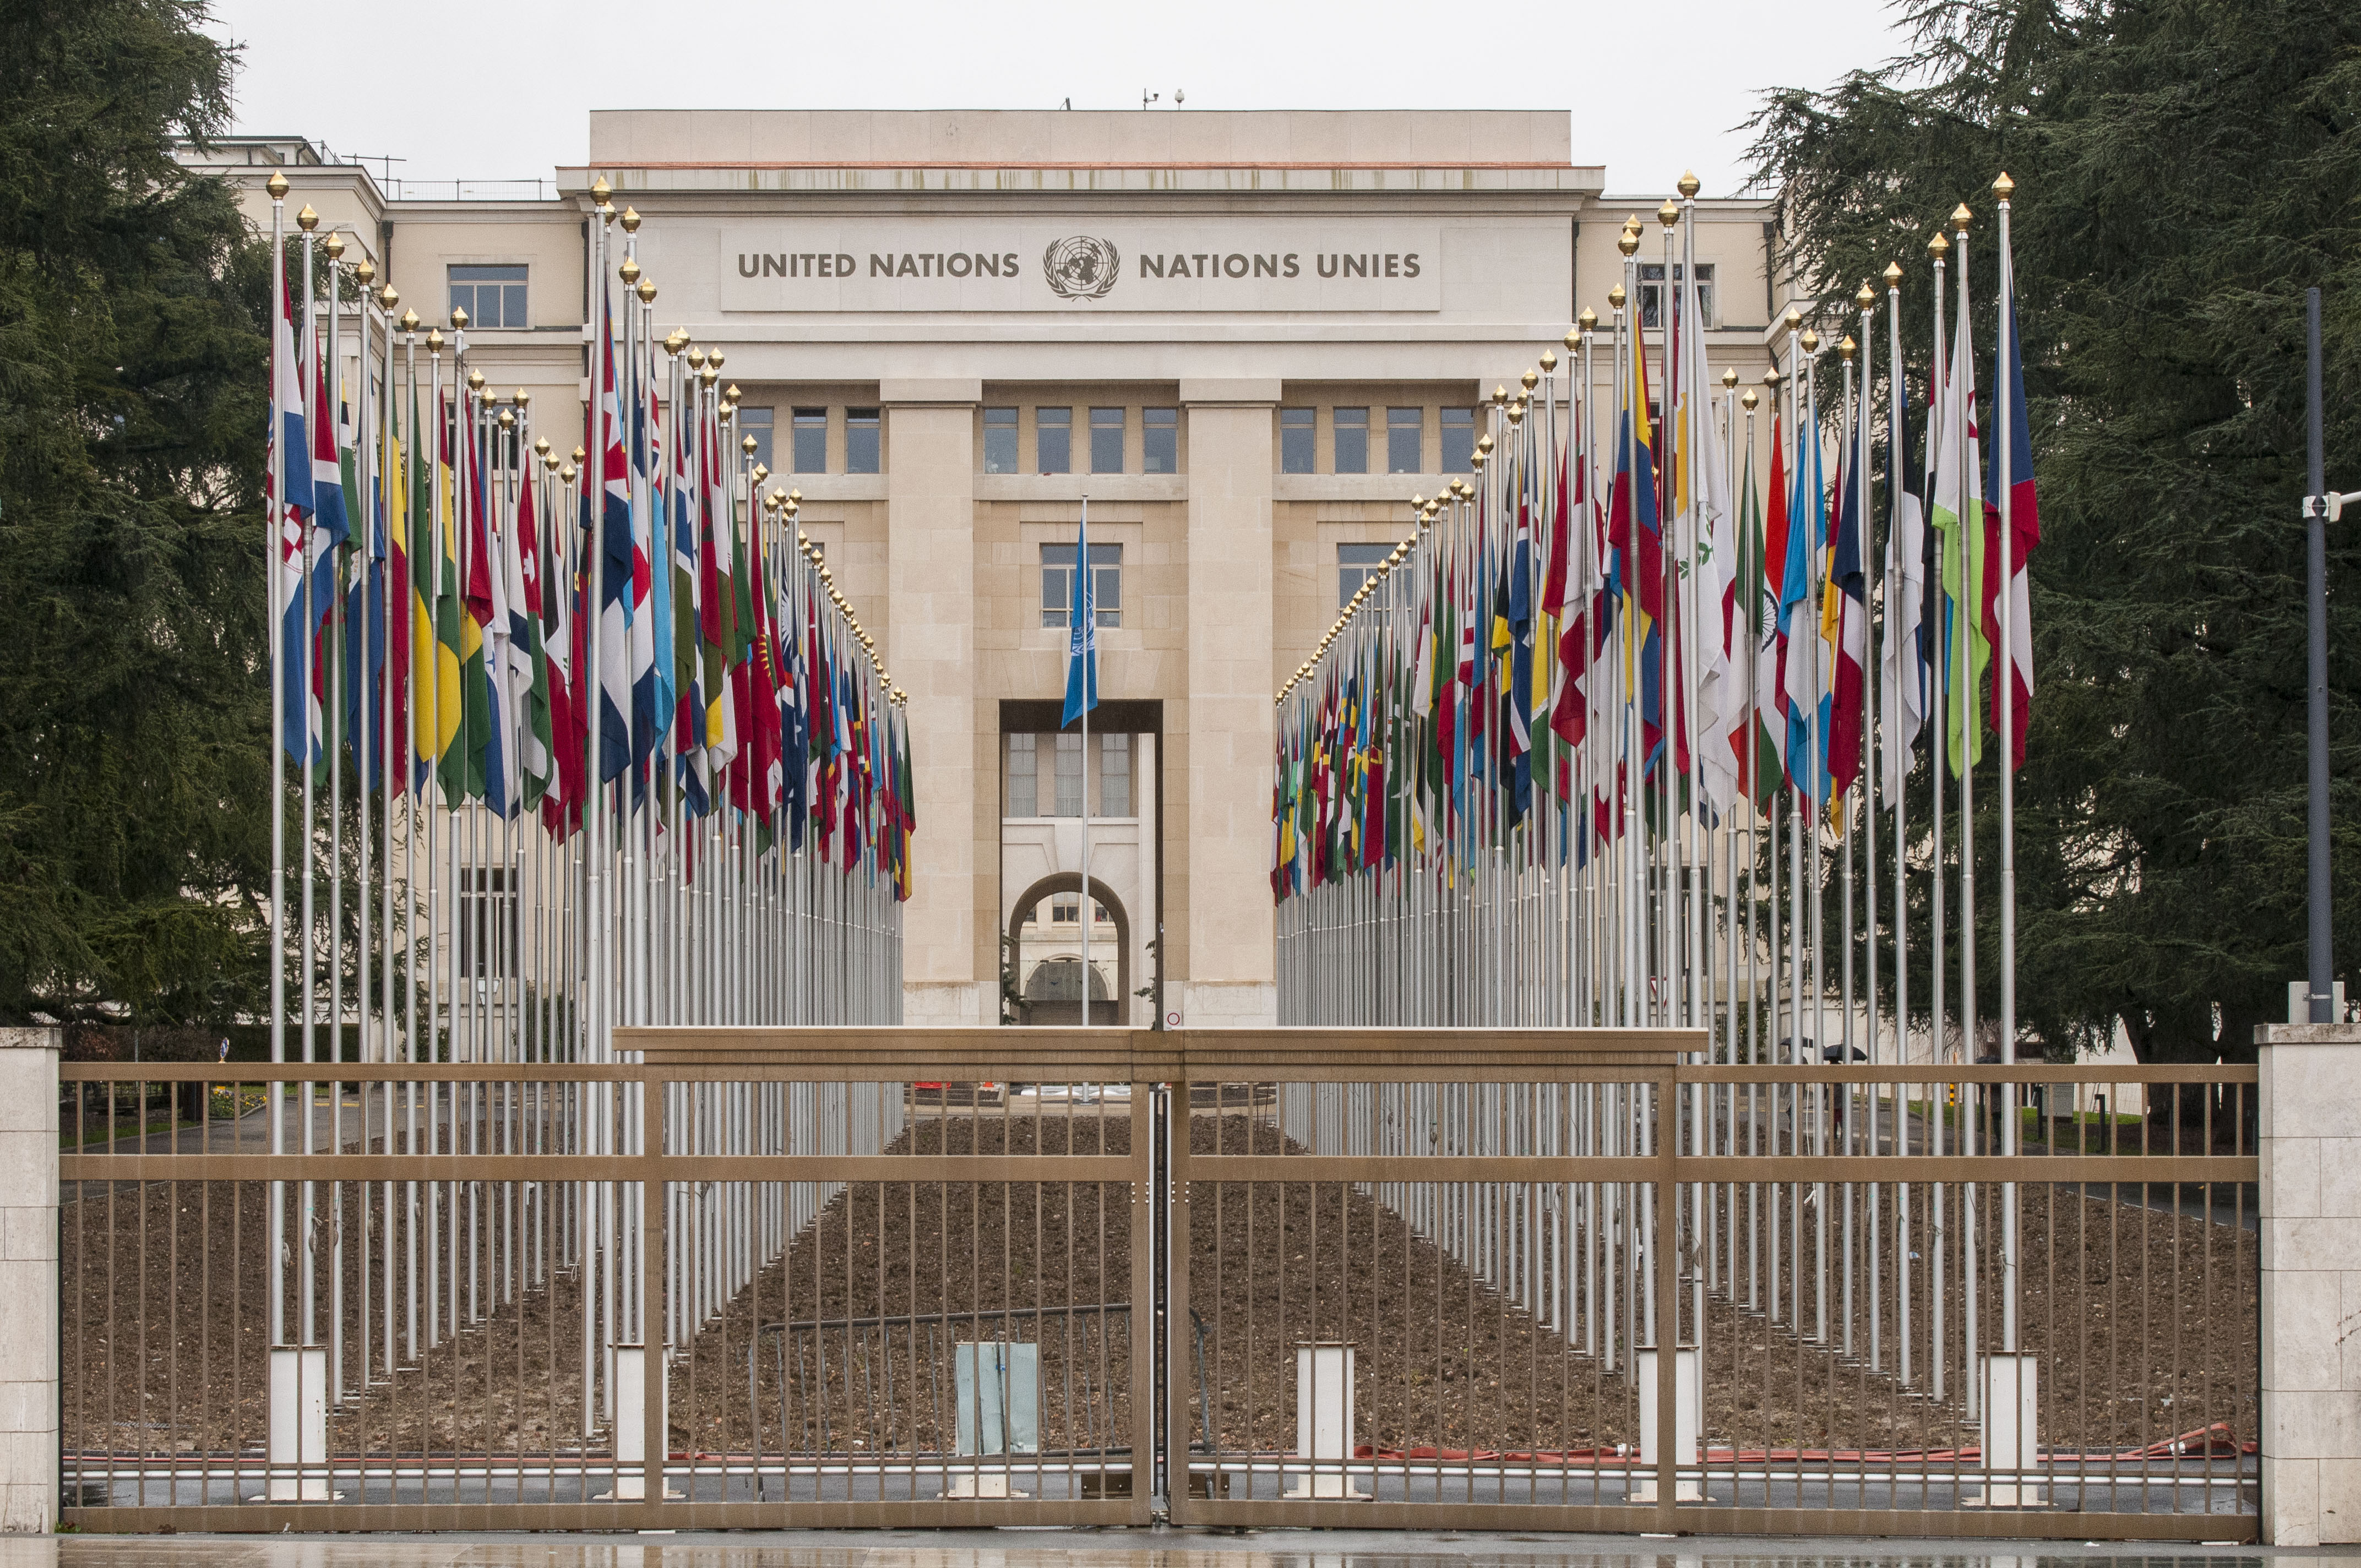 Nations Unies, Nyon